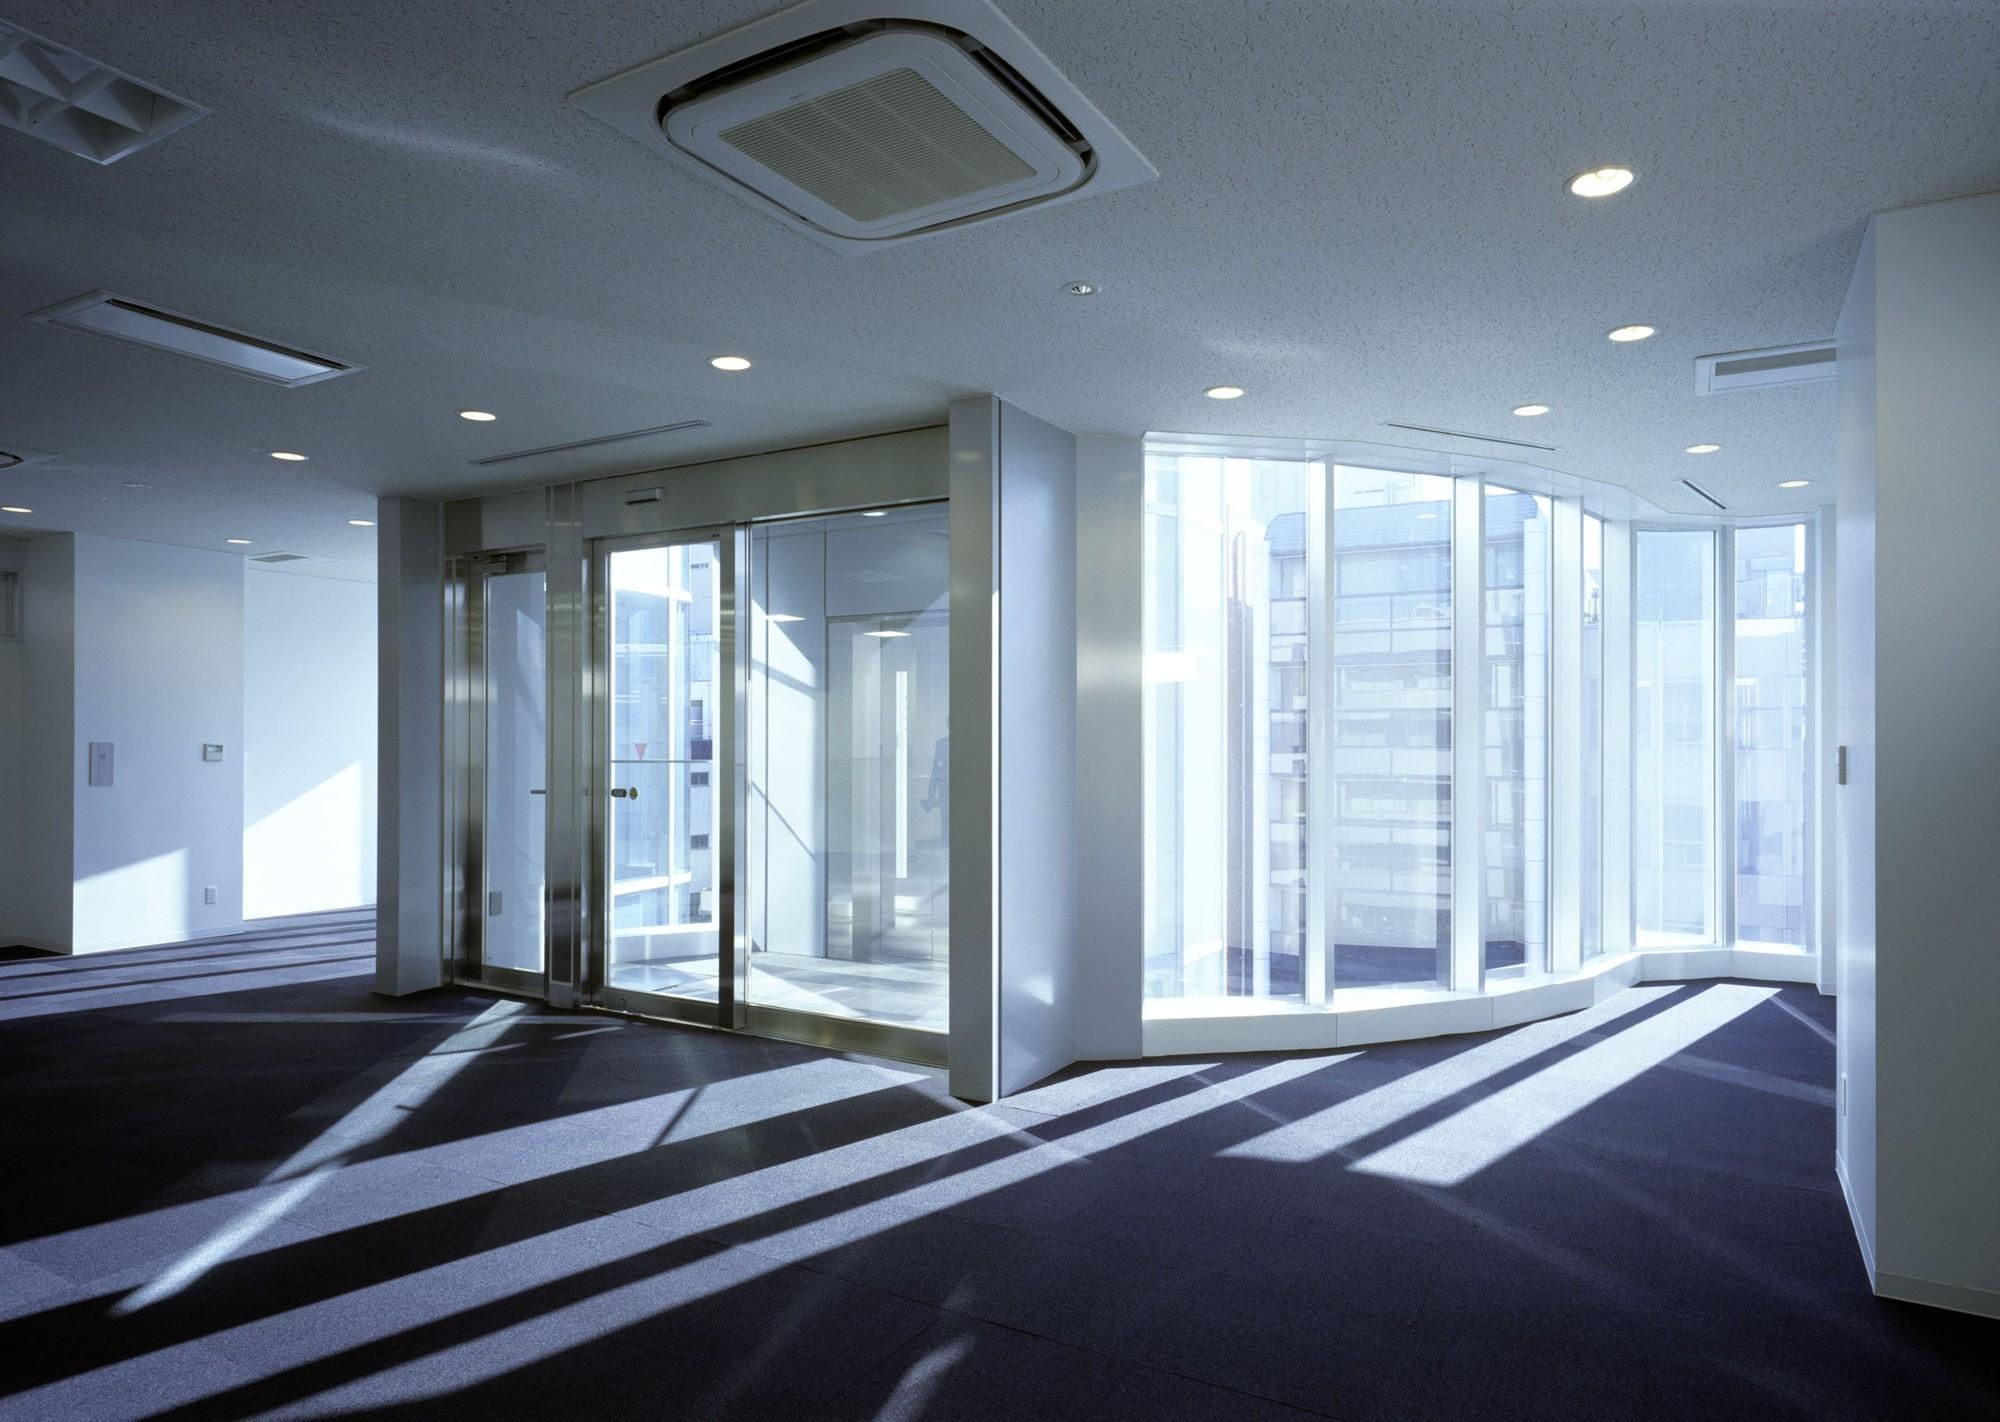 Luminous / Jun Sakaguchi